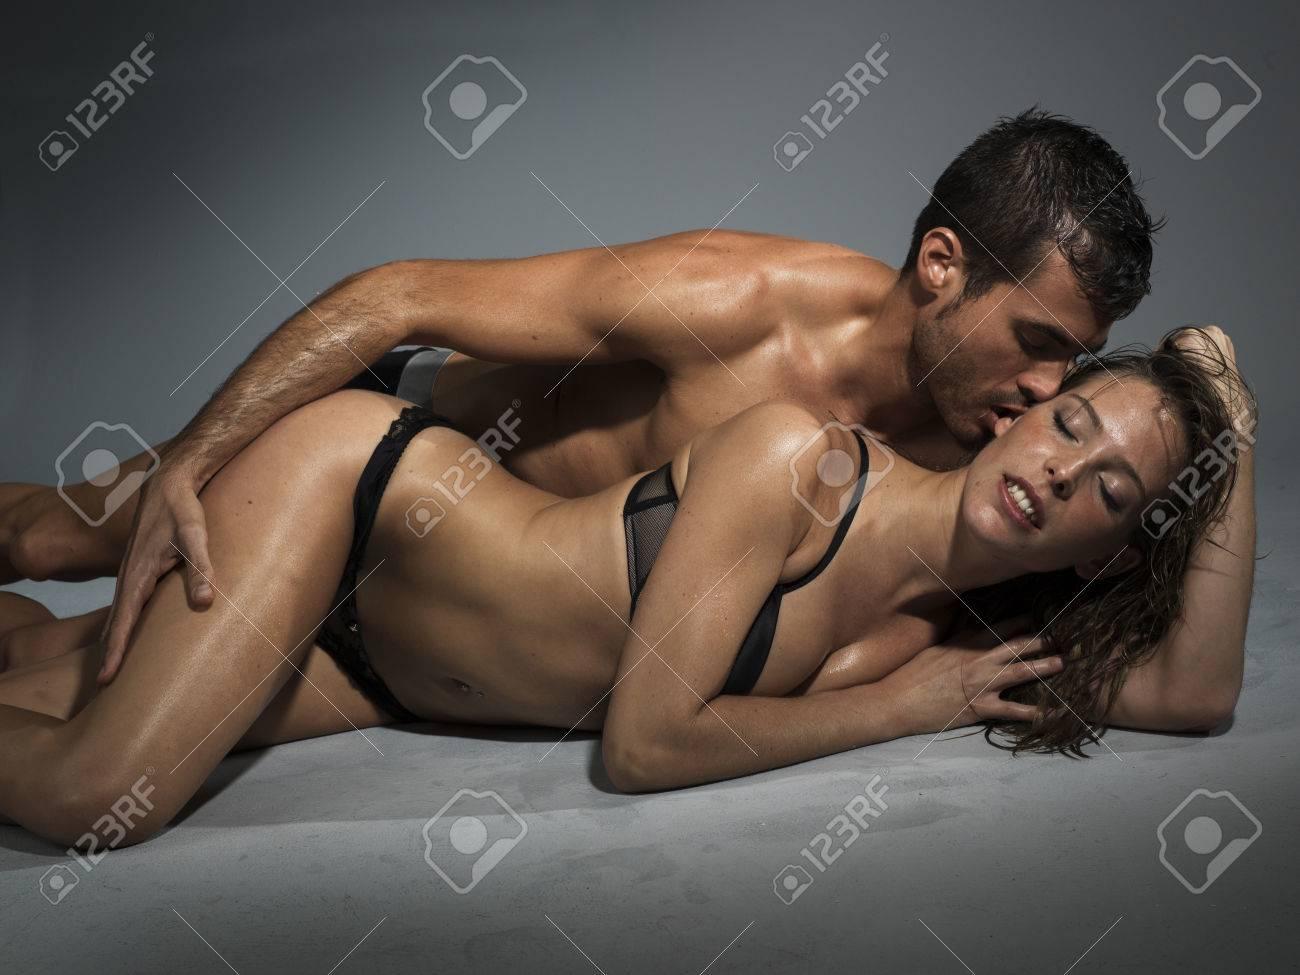 Hombres haciendo el amor com una mujer [PUNIQRANDLINE-(au-dating-names.txt) 51